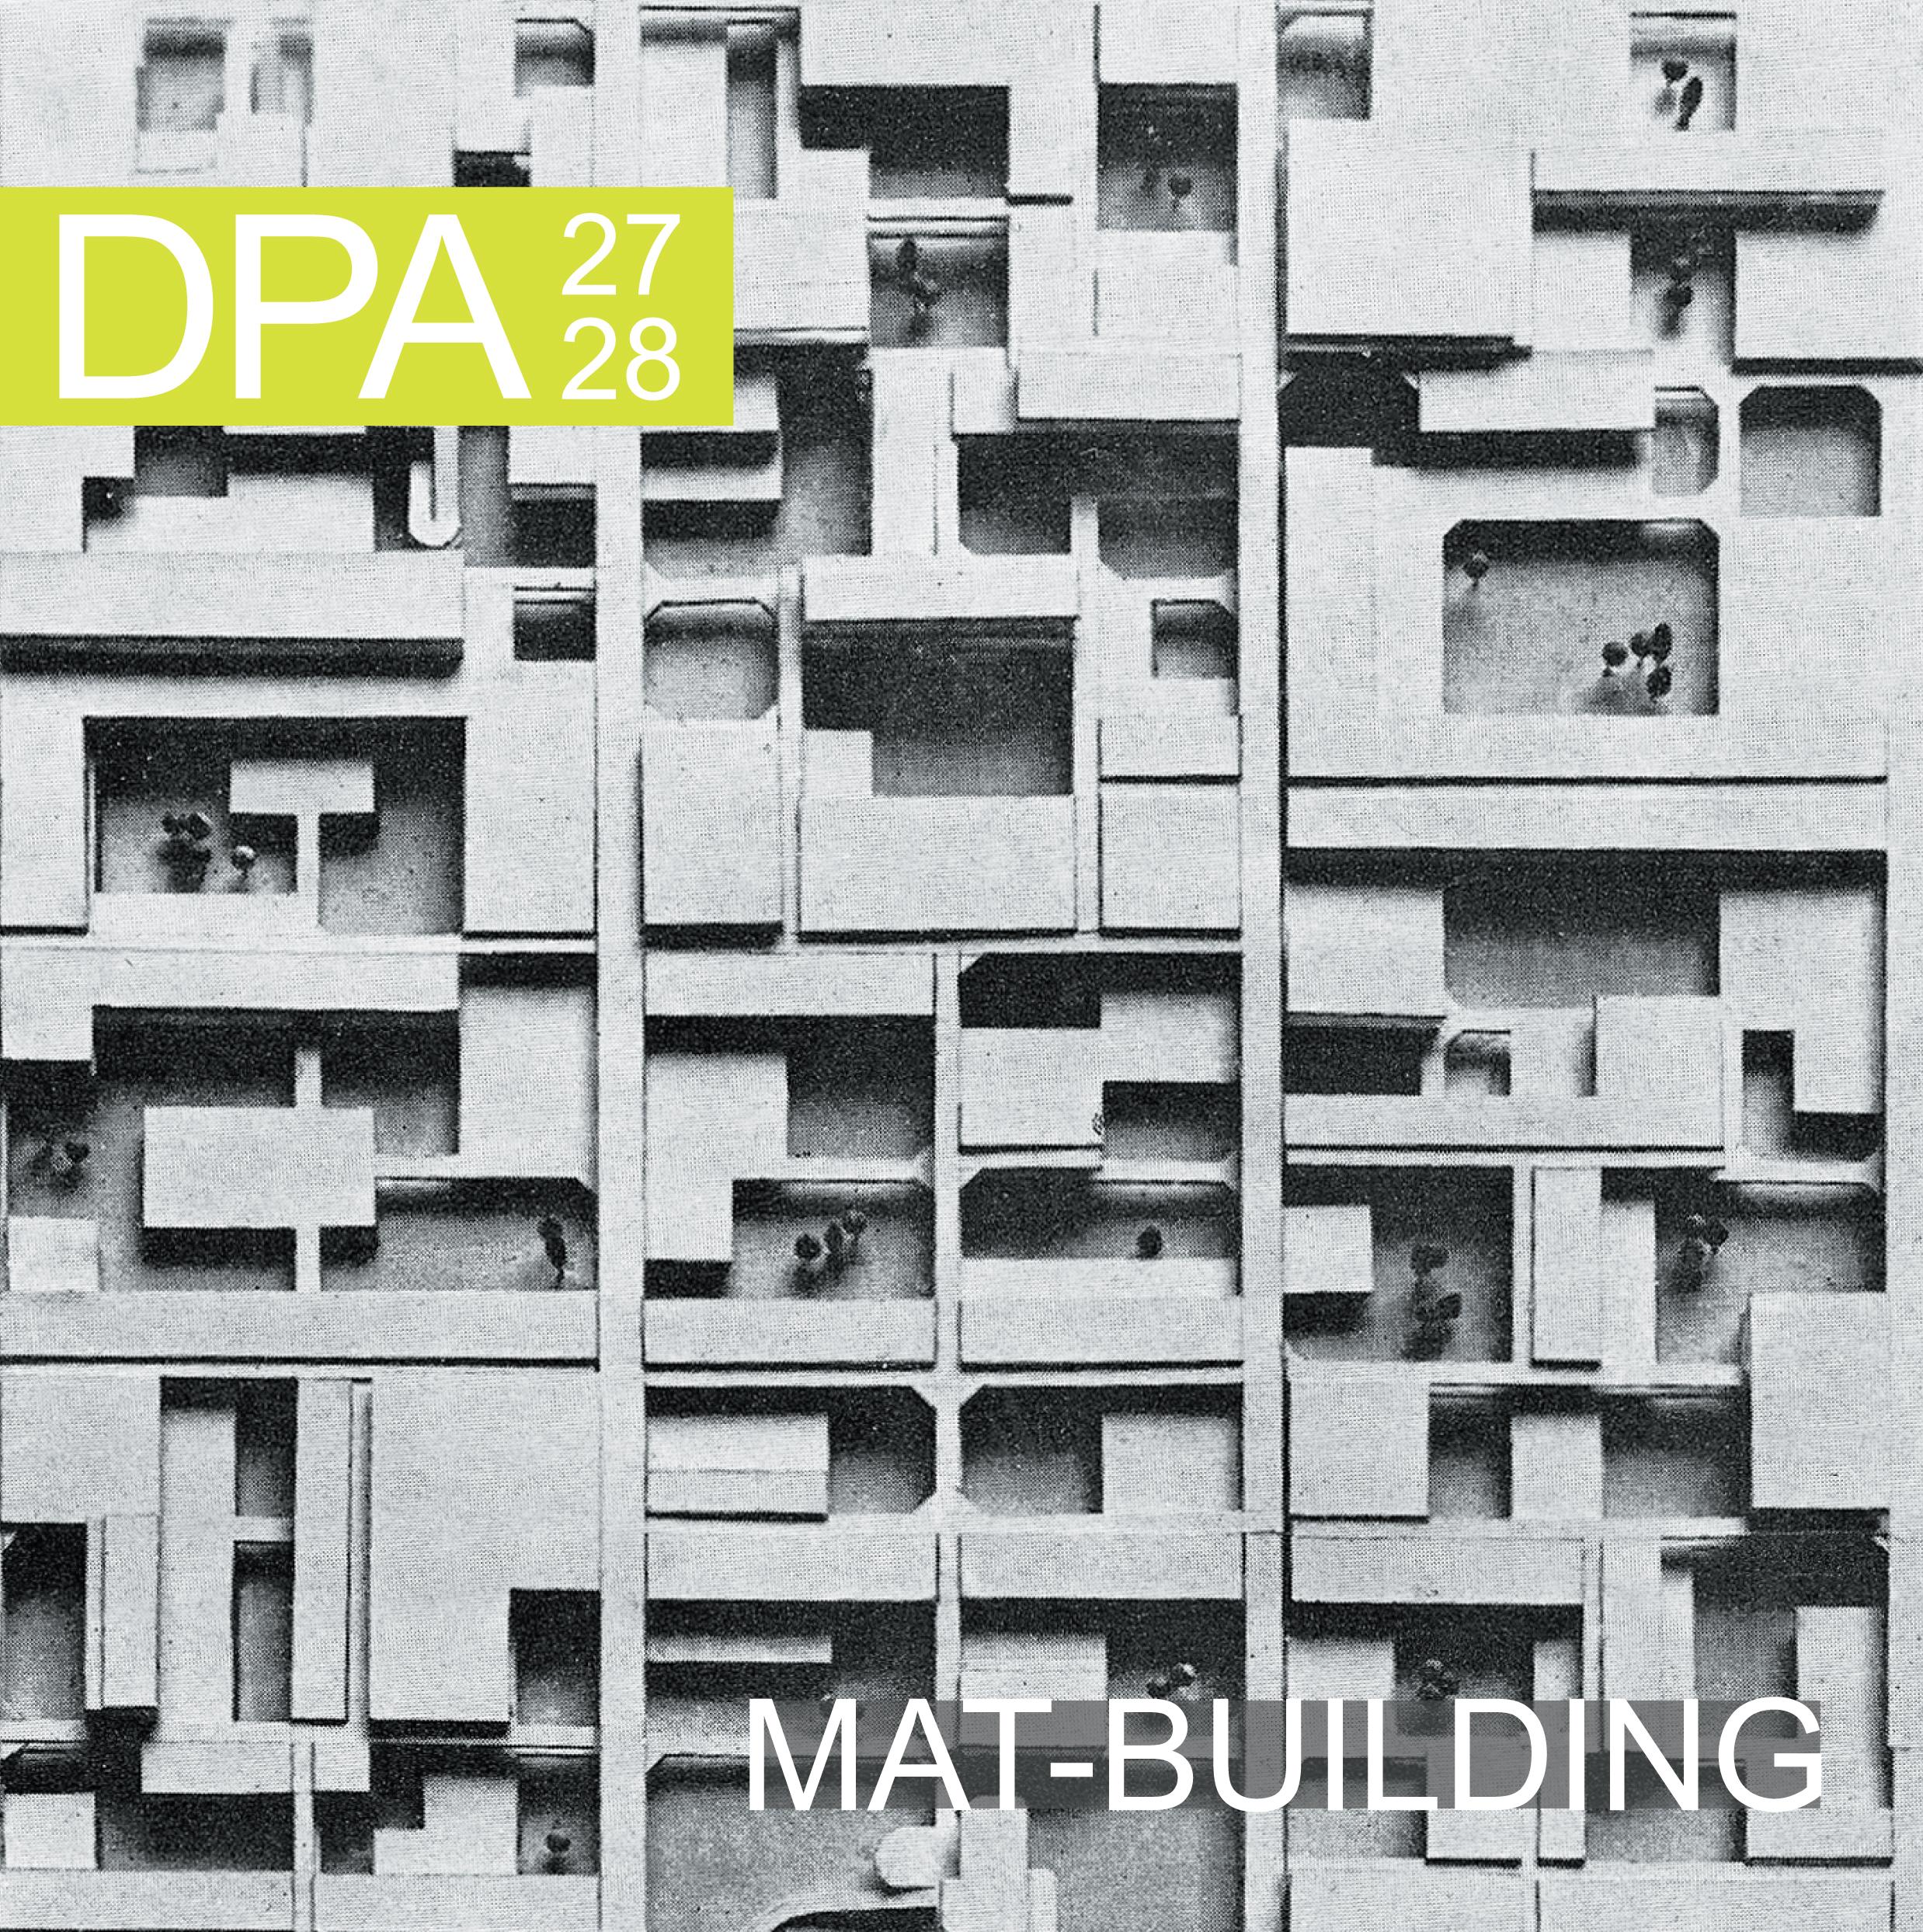 DPA27_Mat-building - Debora Domingo-Calabuig